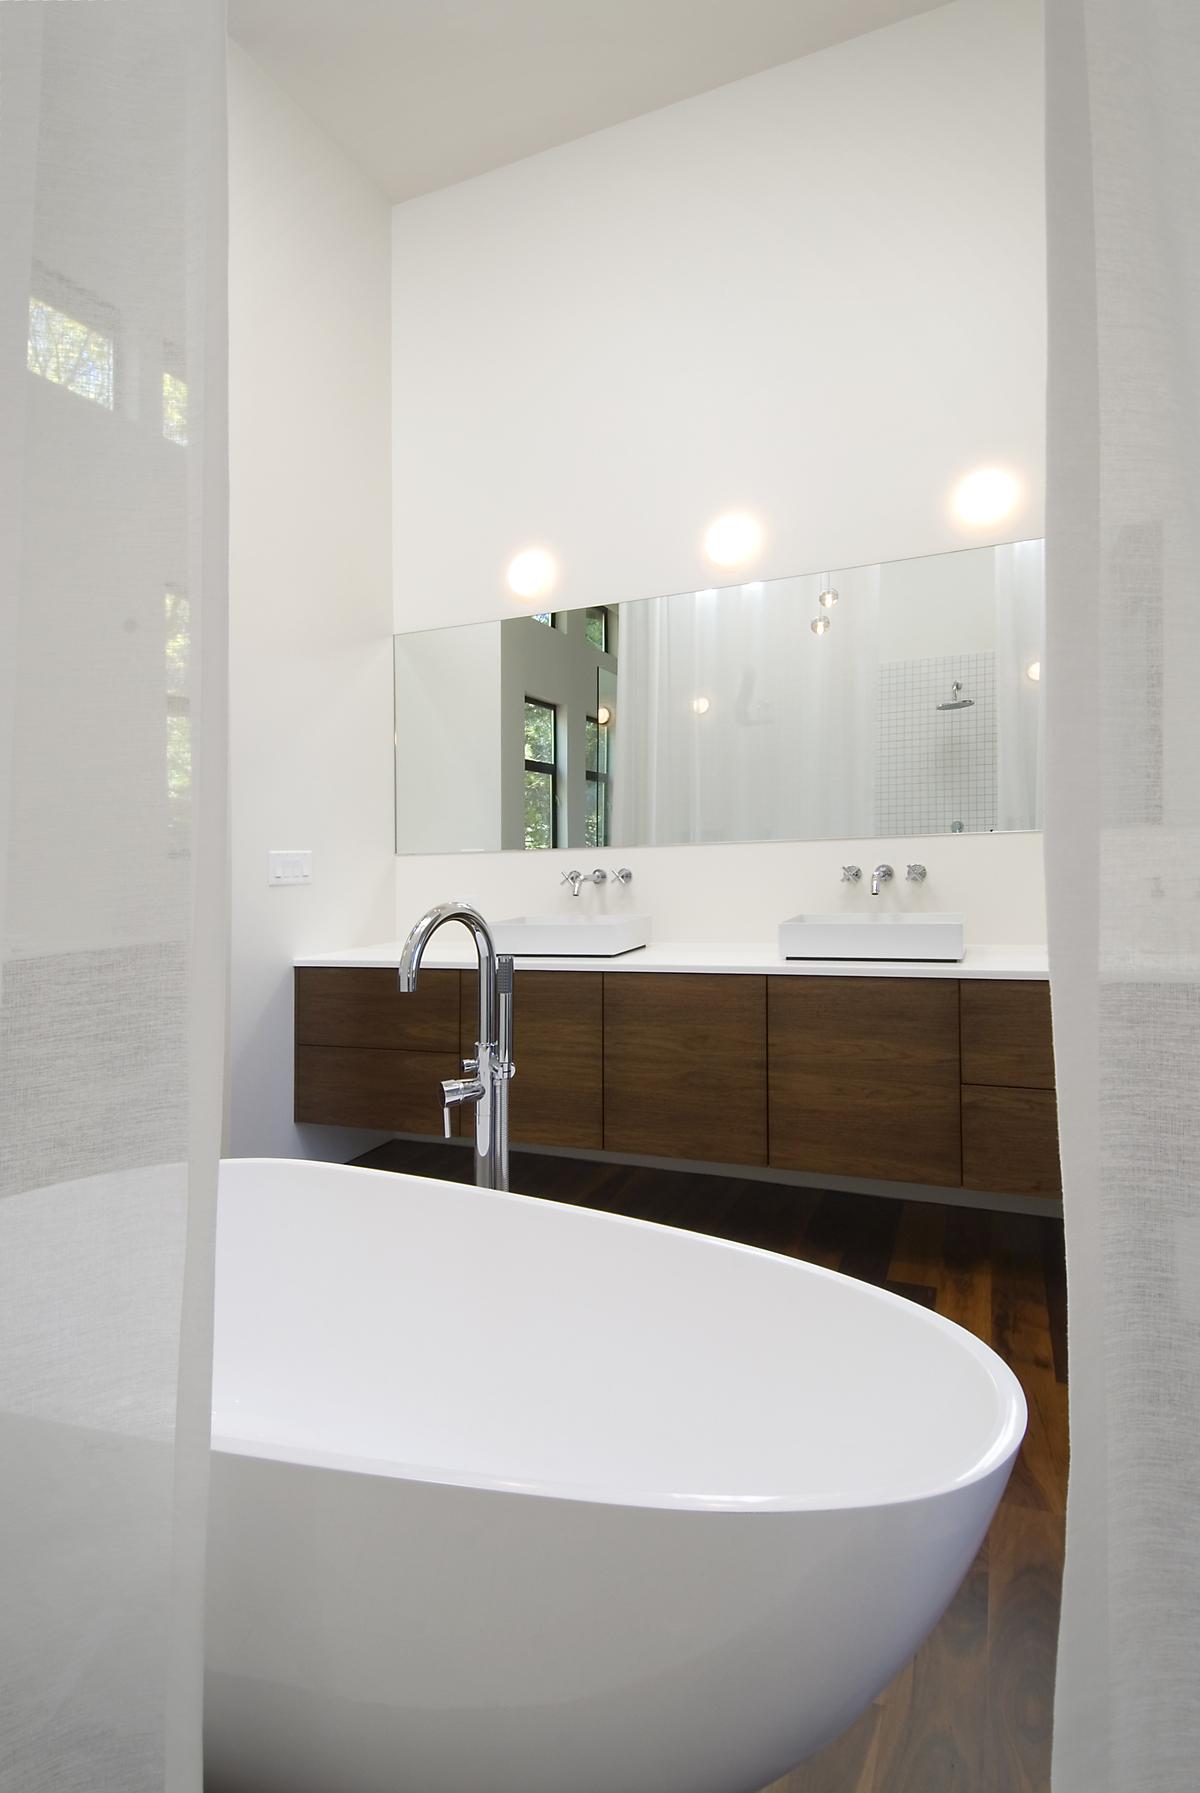 vanity from shower